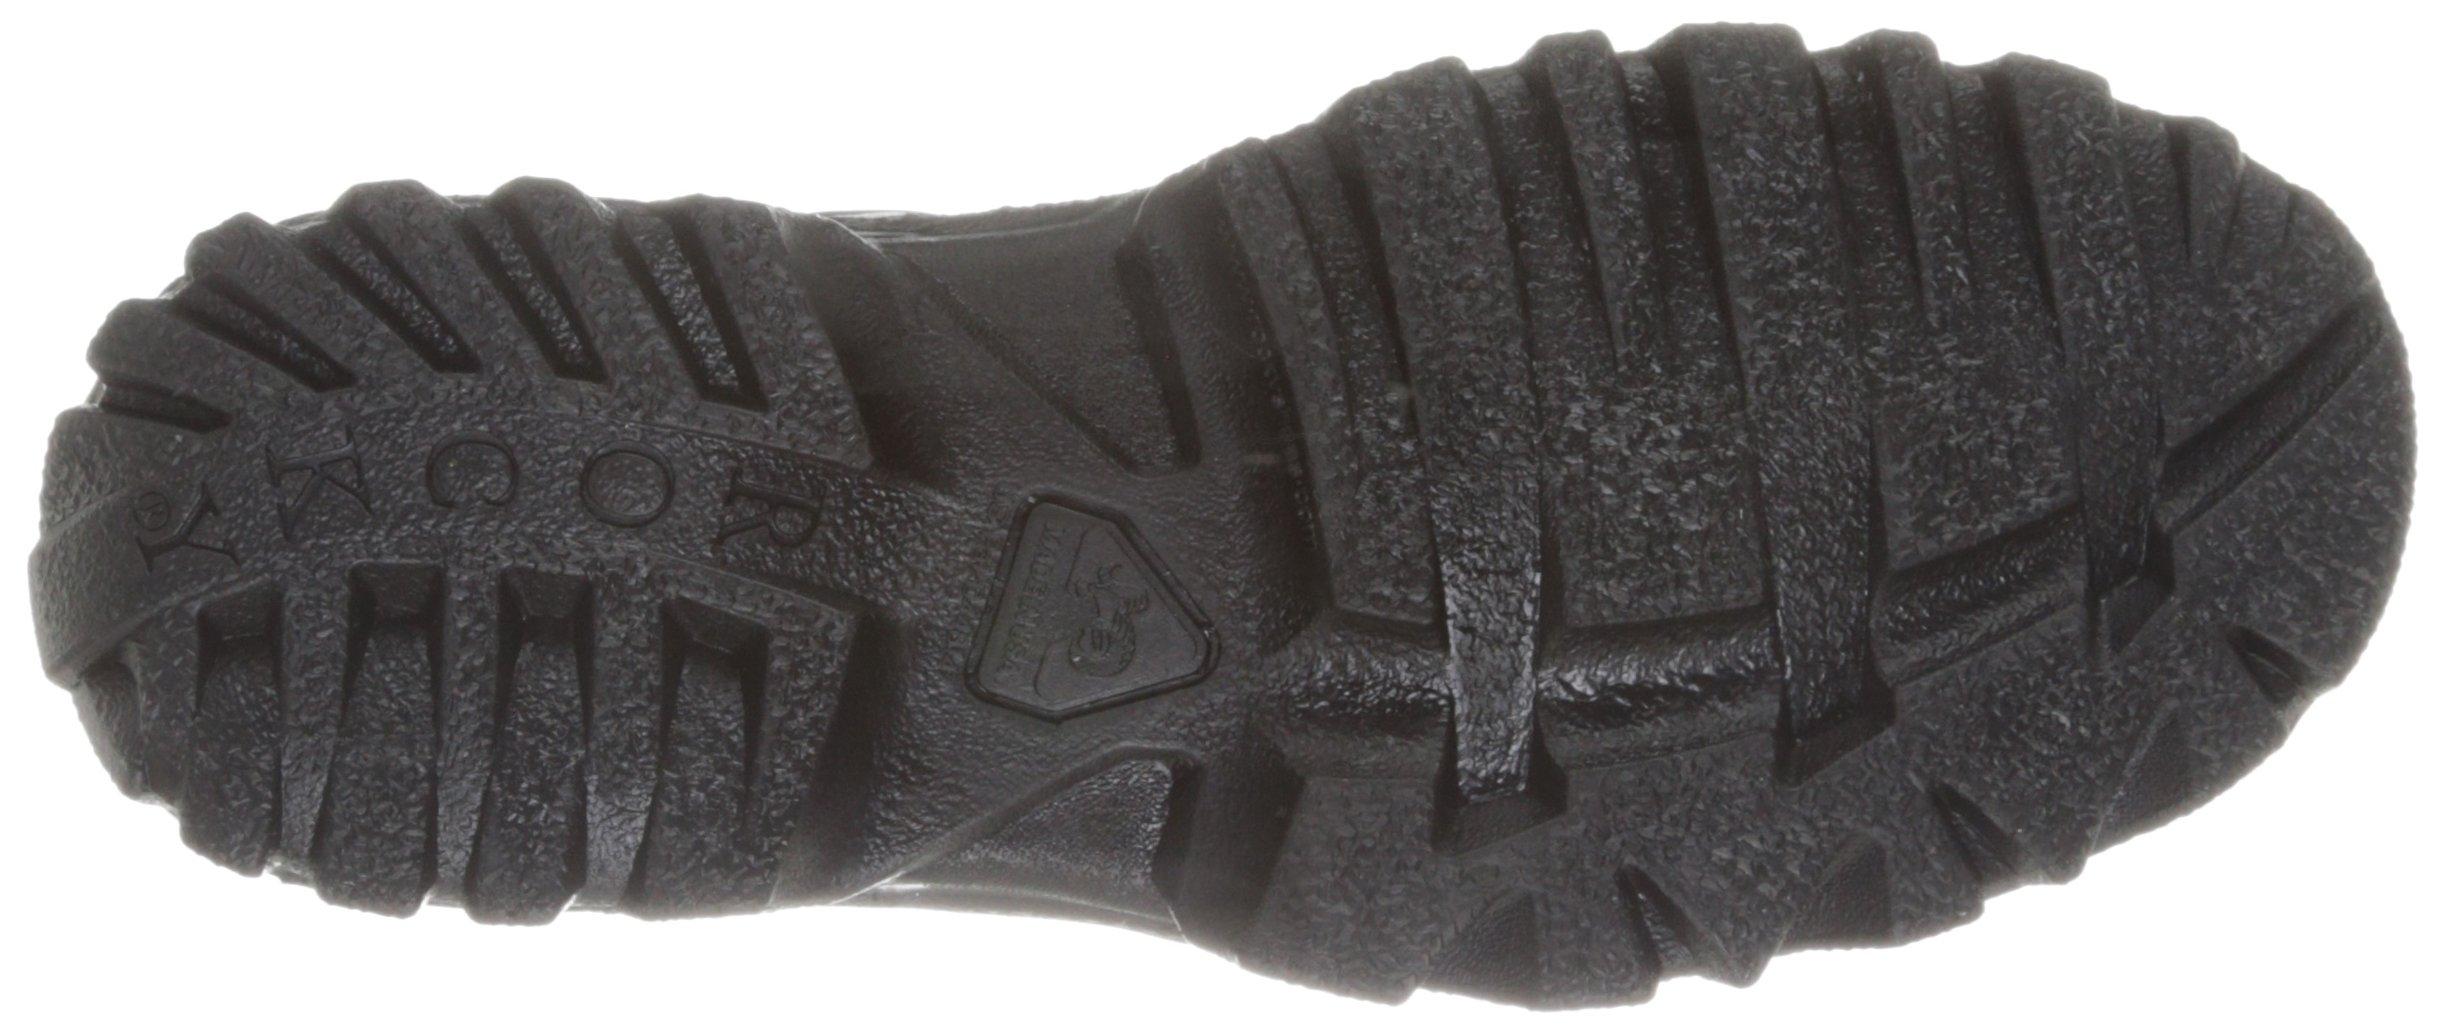 Rocky Men's Postal TMC Oxford Work Boot,Black,11.5 M US by Rocky (Image #3)